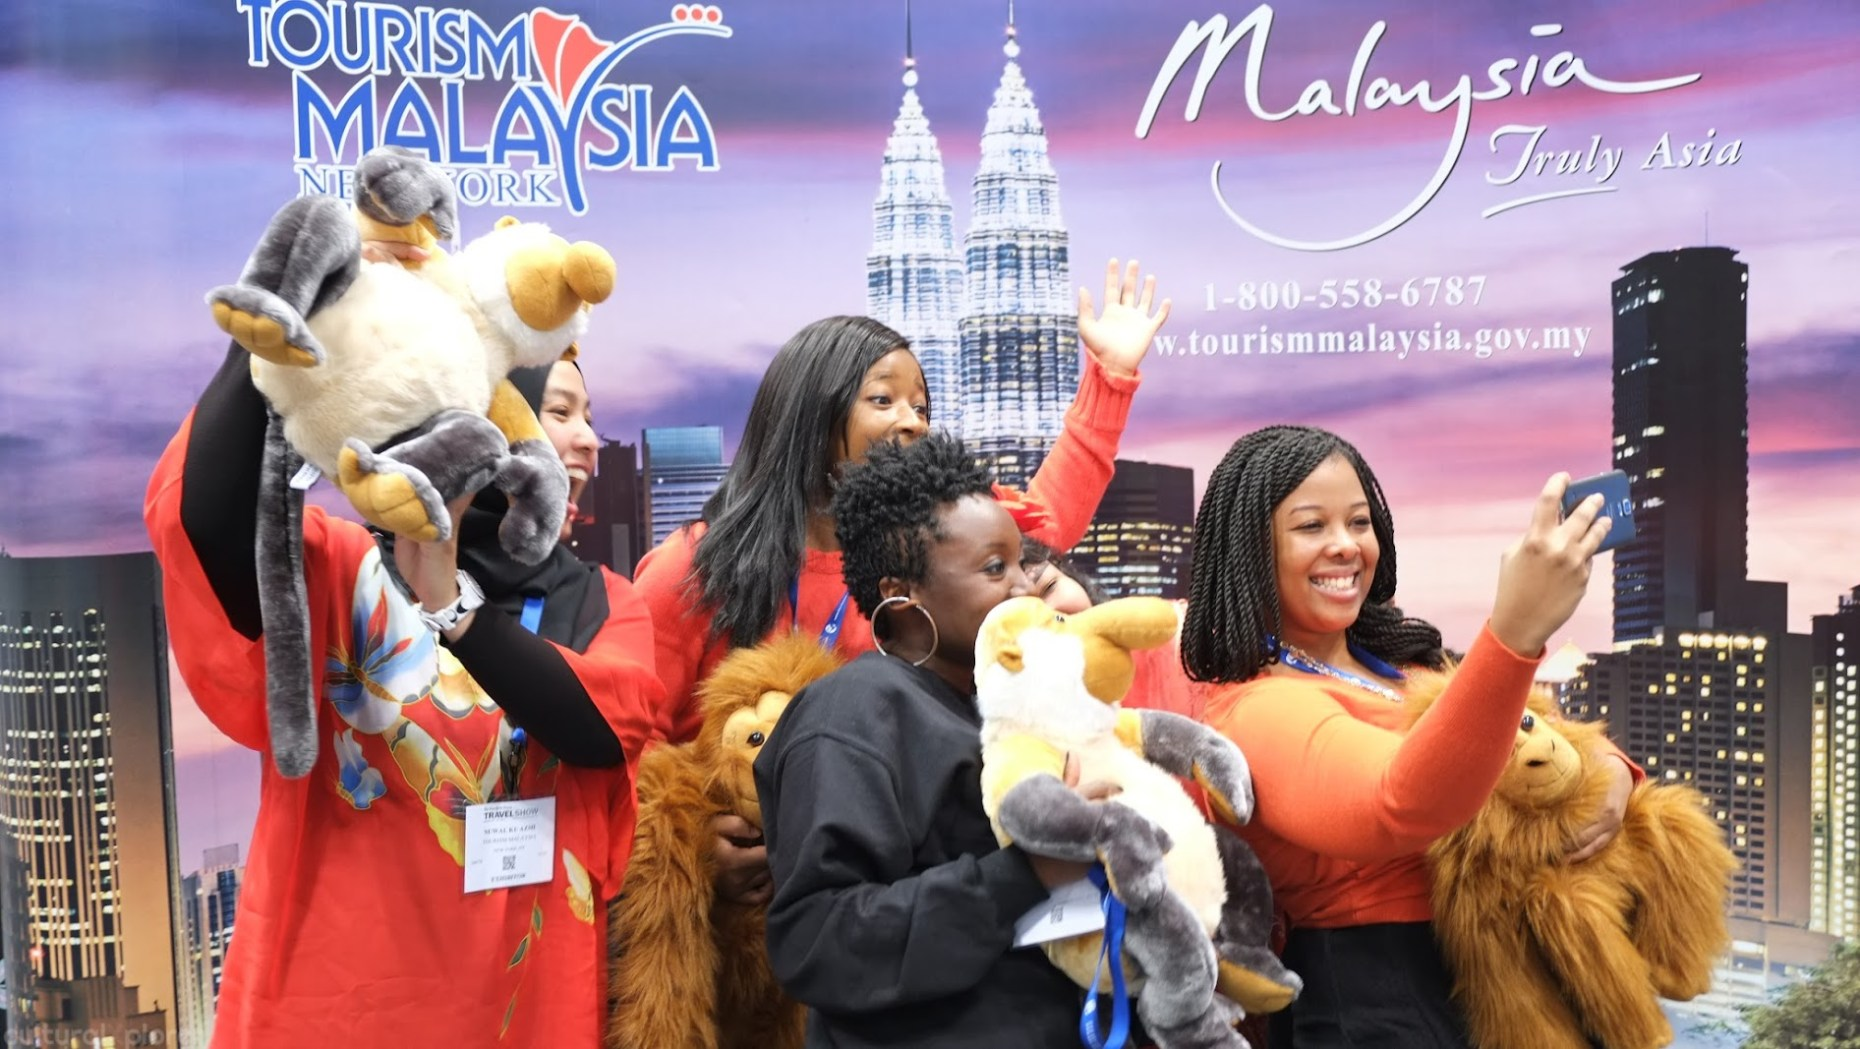 Tourism Malaysia Selfie